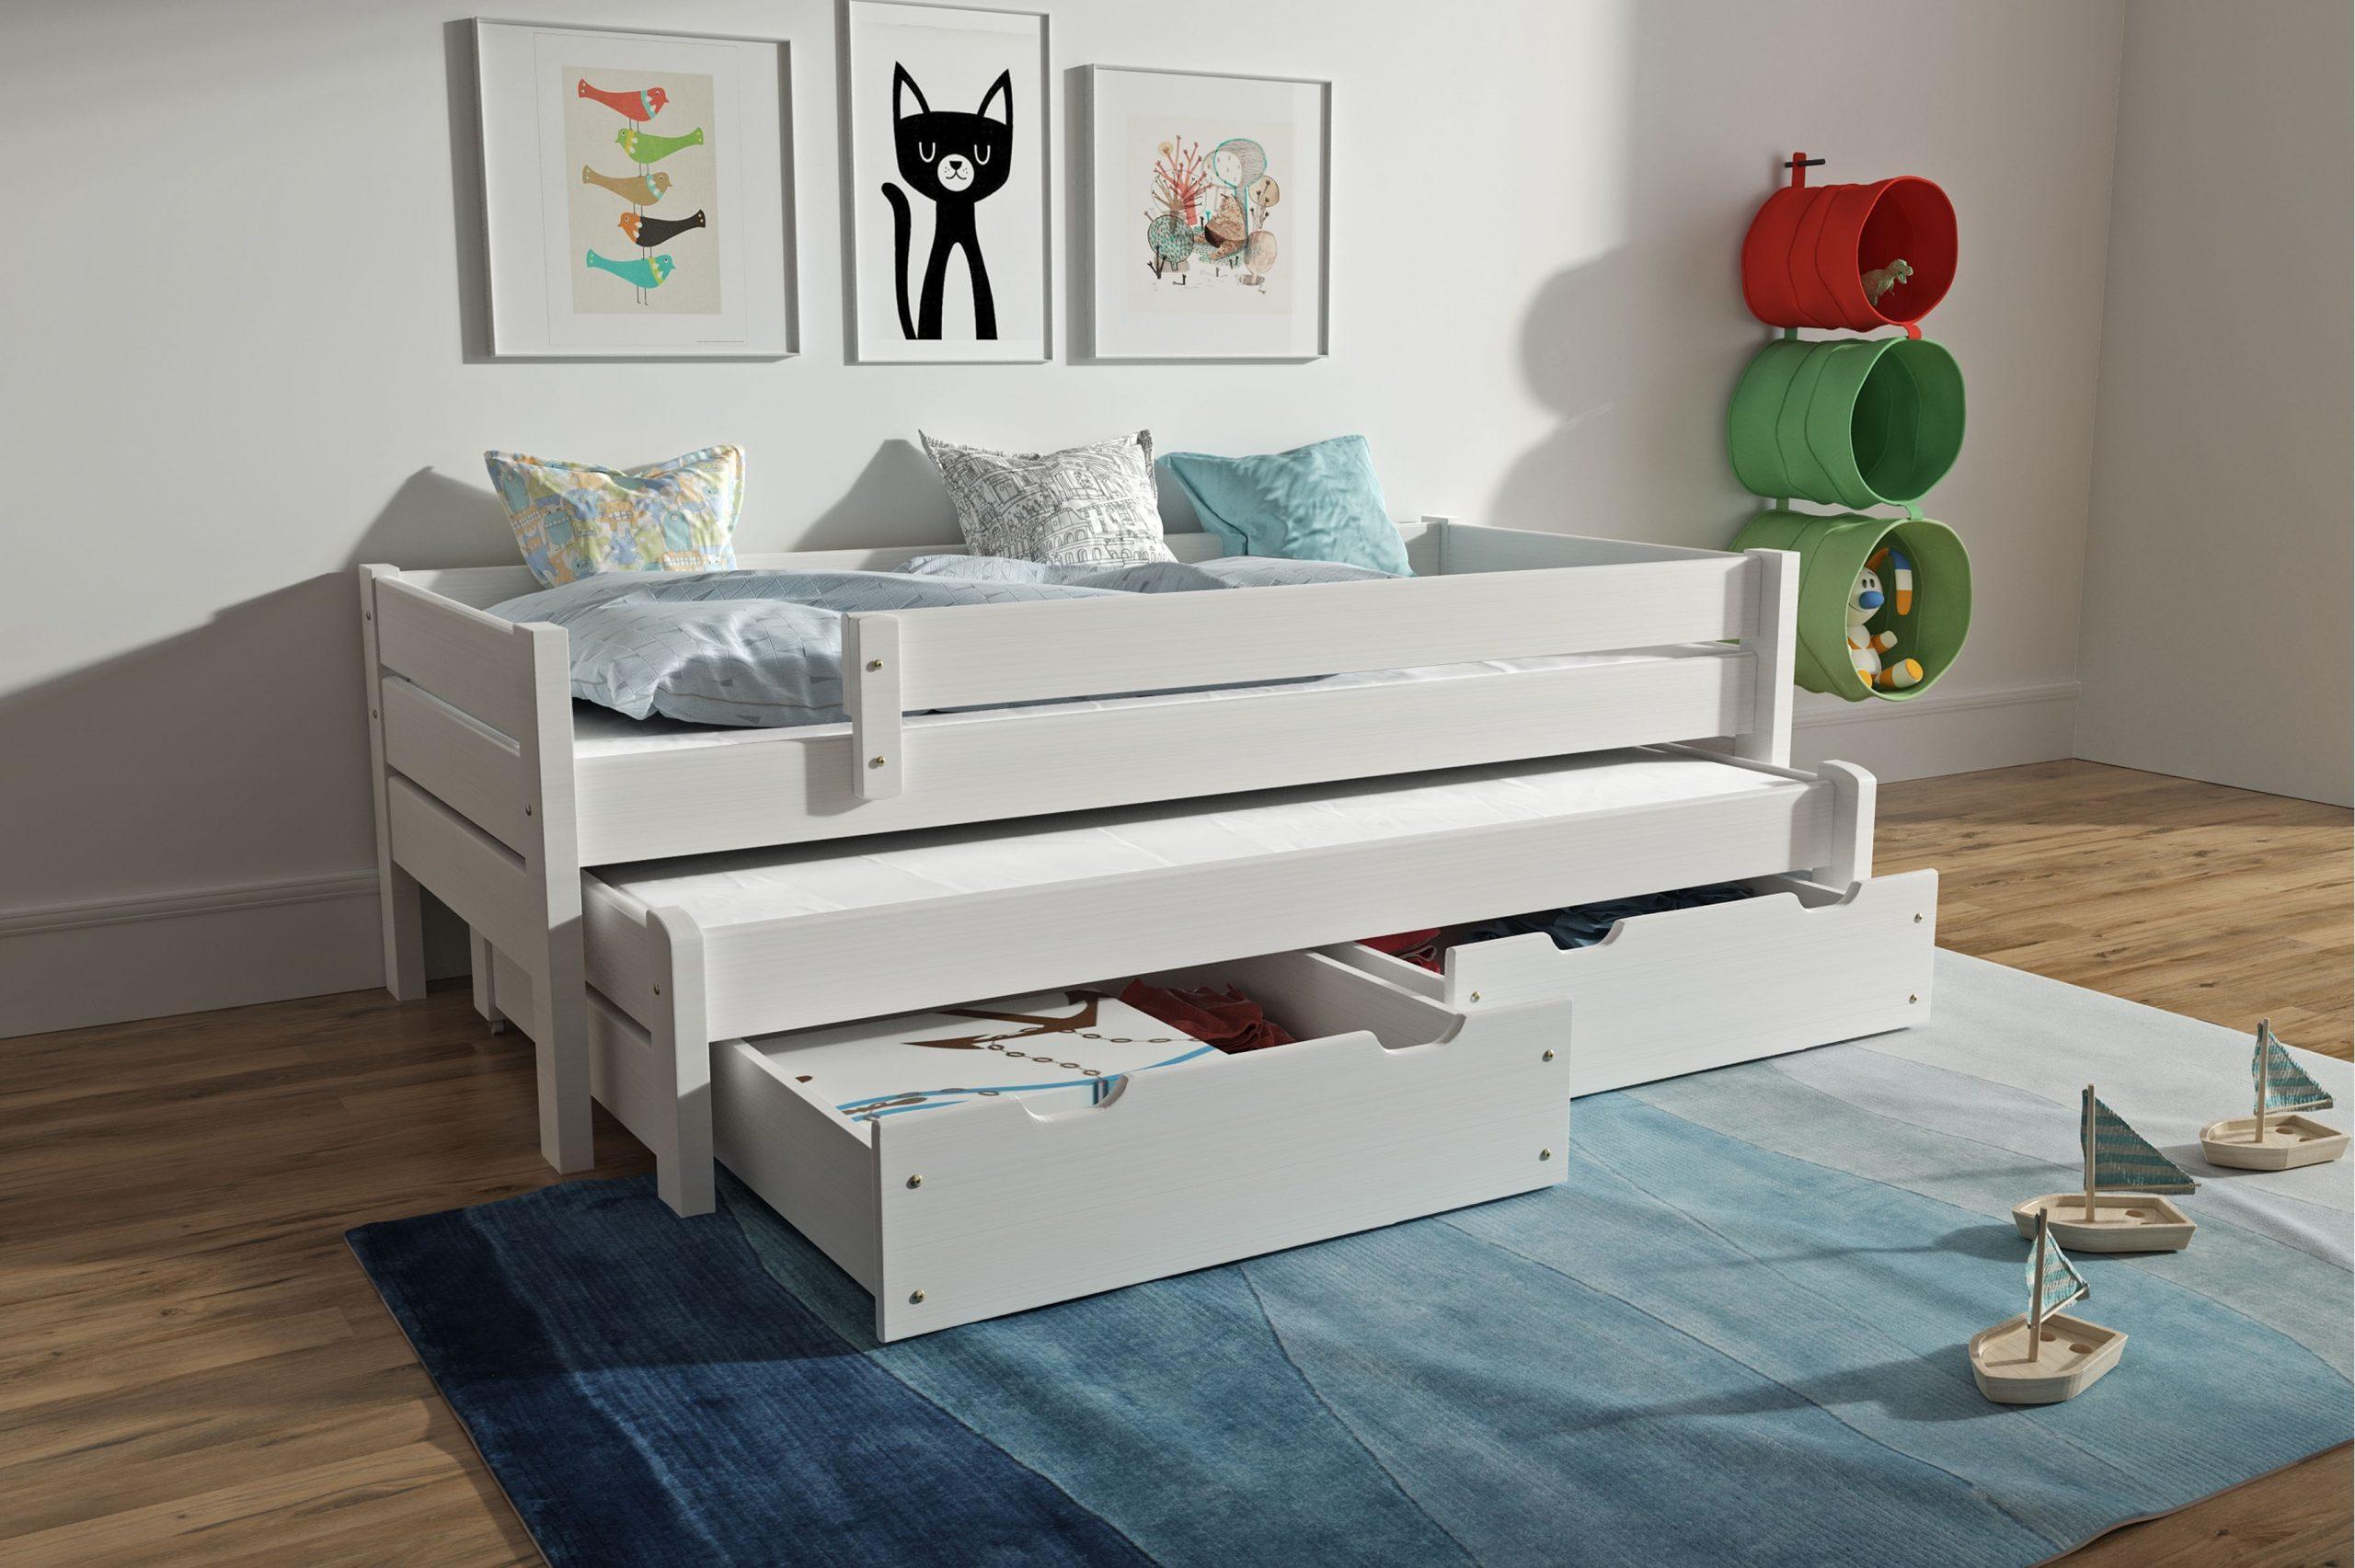 Full Size of Bett Mit Ausziehbett Ikea Flexa Betten 120 Krankenhaus Joop Regal Test Pantryküche Kühlschrank Sitzbank Küche Lehne Schreibtisch Eiche Massiv 180x200 Wohnzimmer Bett Mit Ausziehbett Ikea